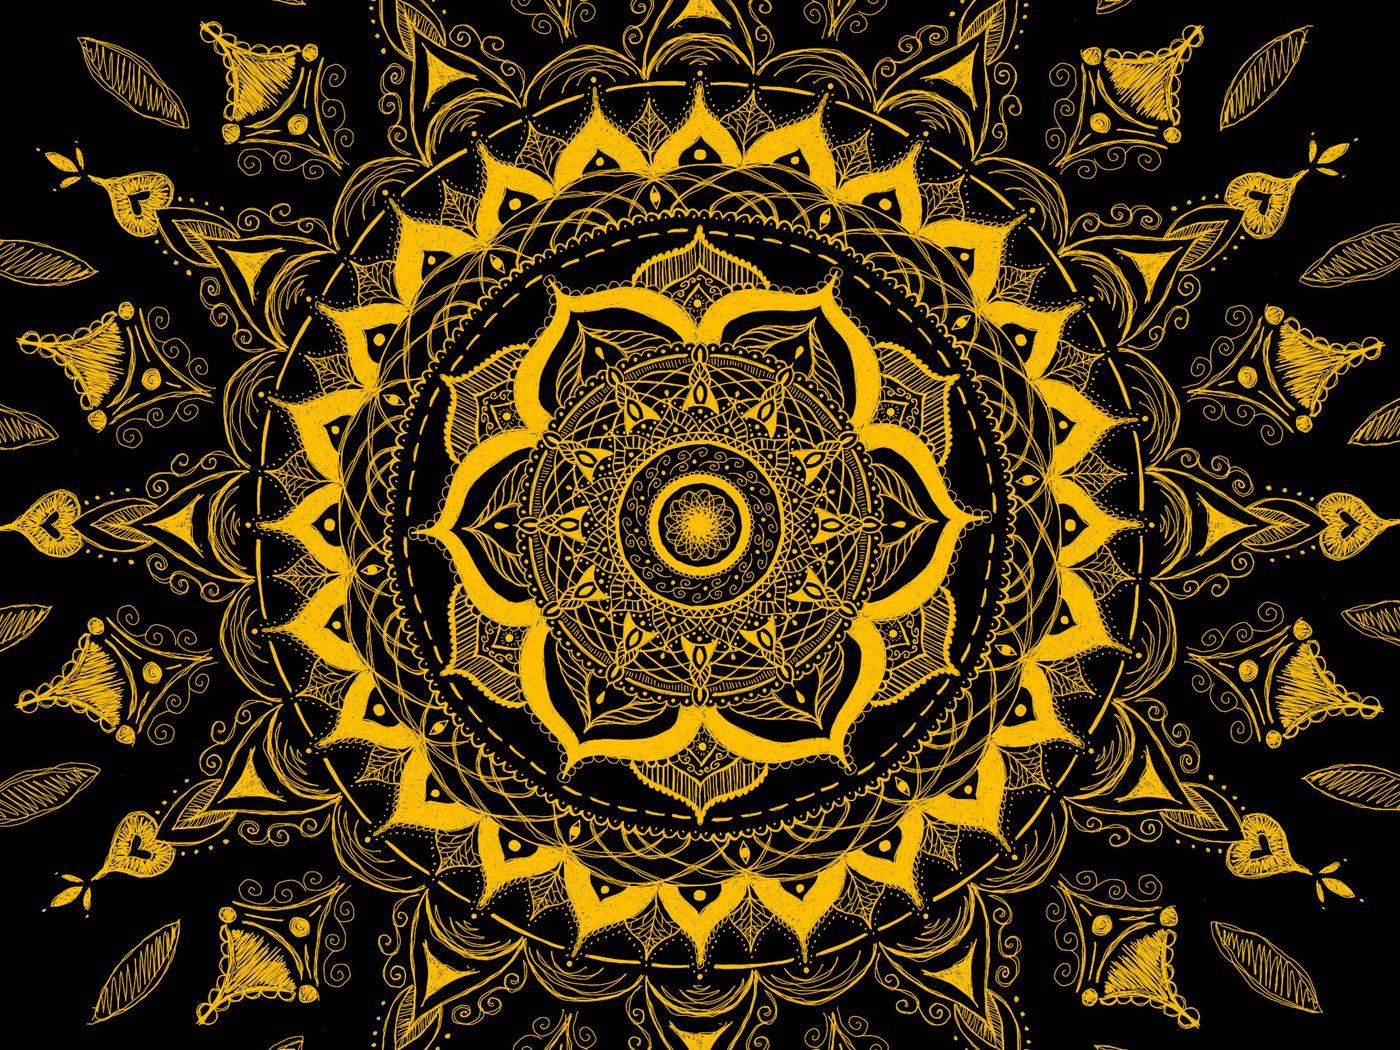 1400x1050 Wallpaper mandala, pattern, abstraction, tangled, yellow